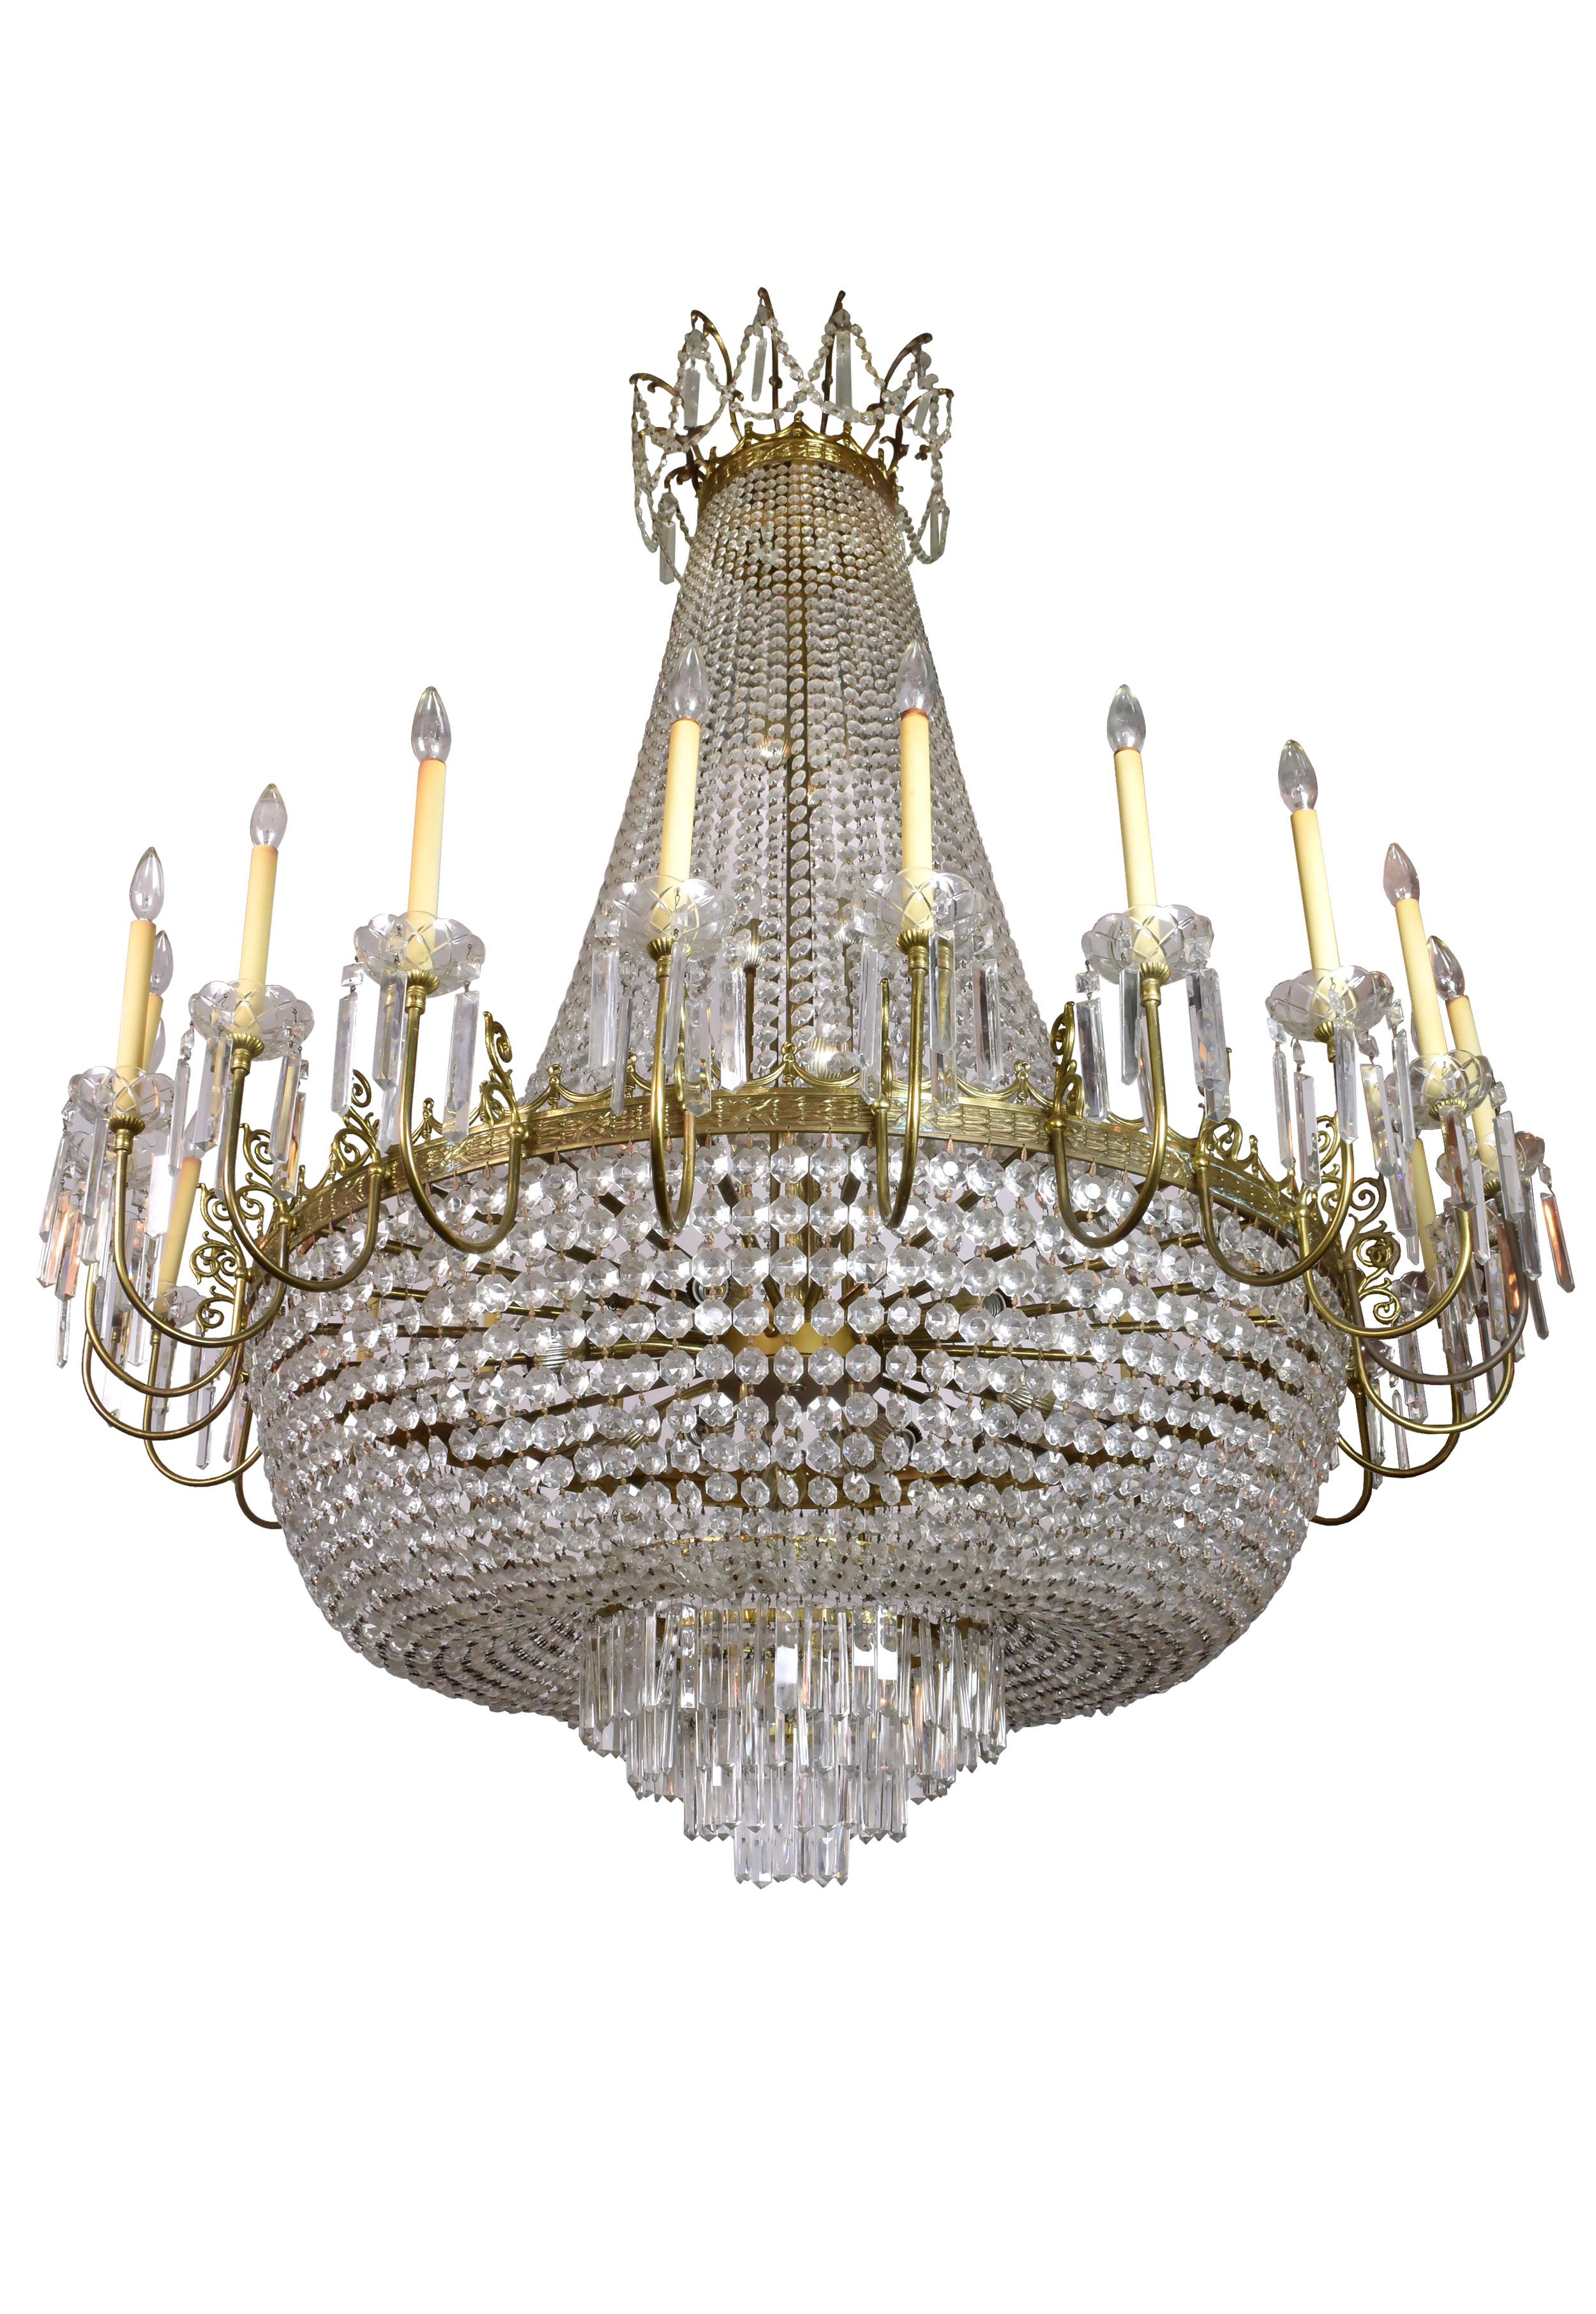 47206-italian-crystal-chandelier-MAIN-image.jpg